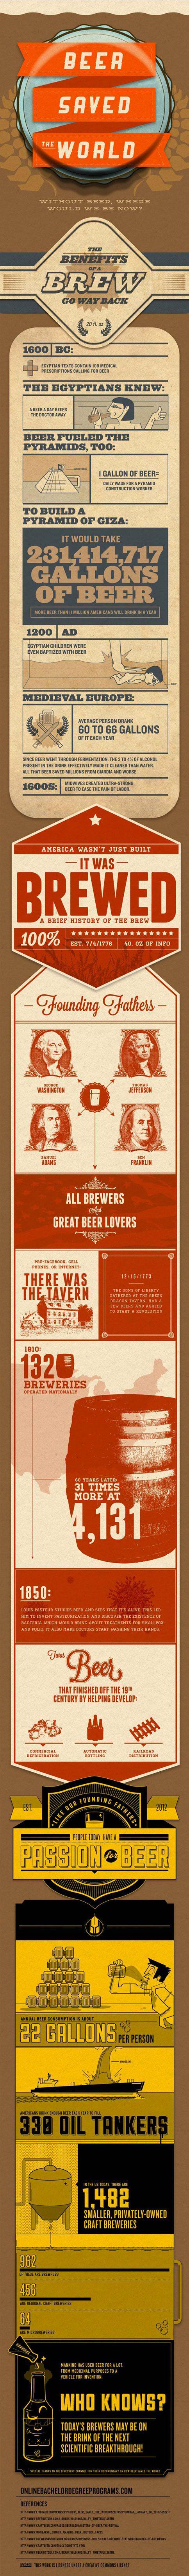 beer saved world.